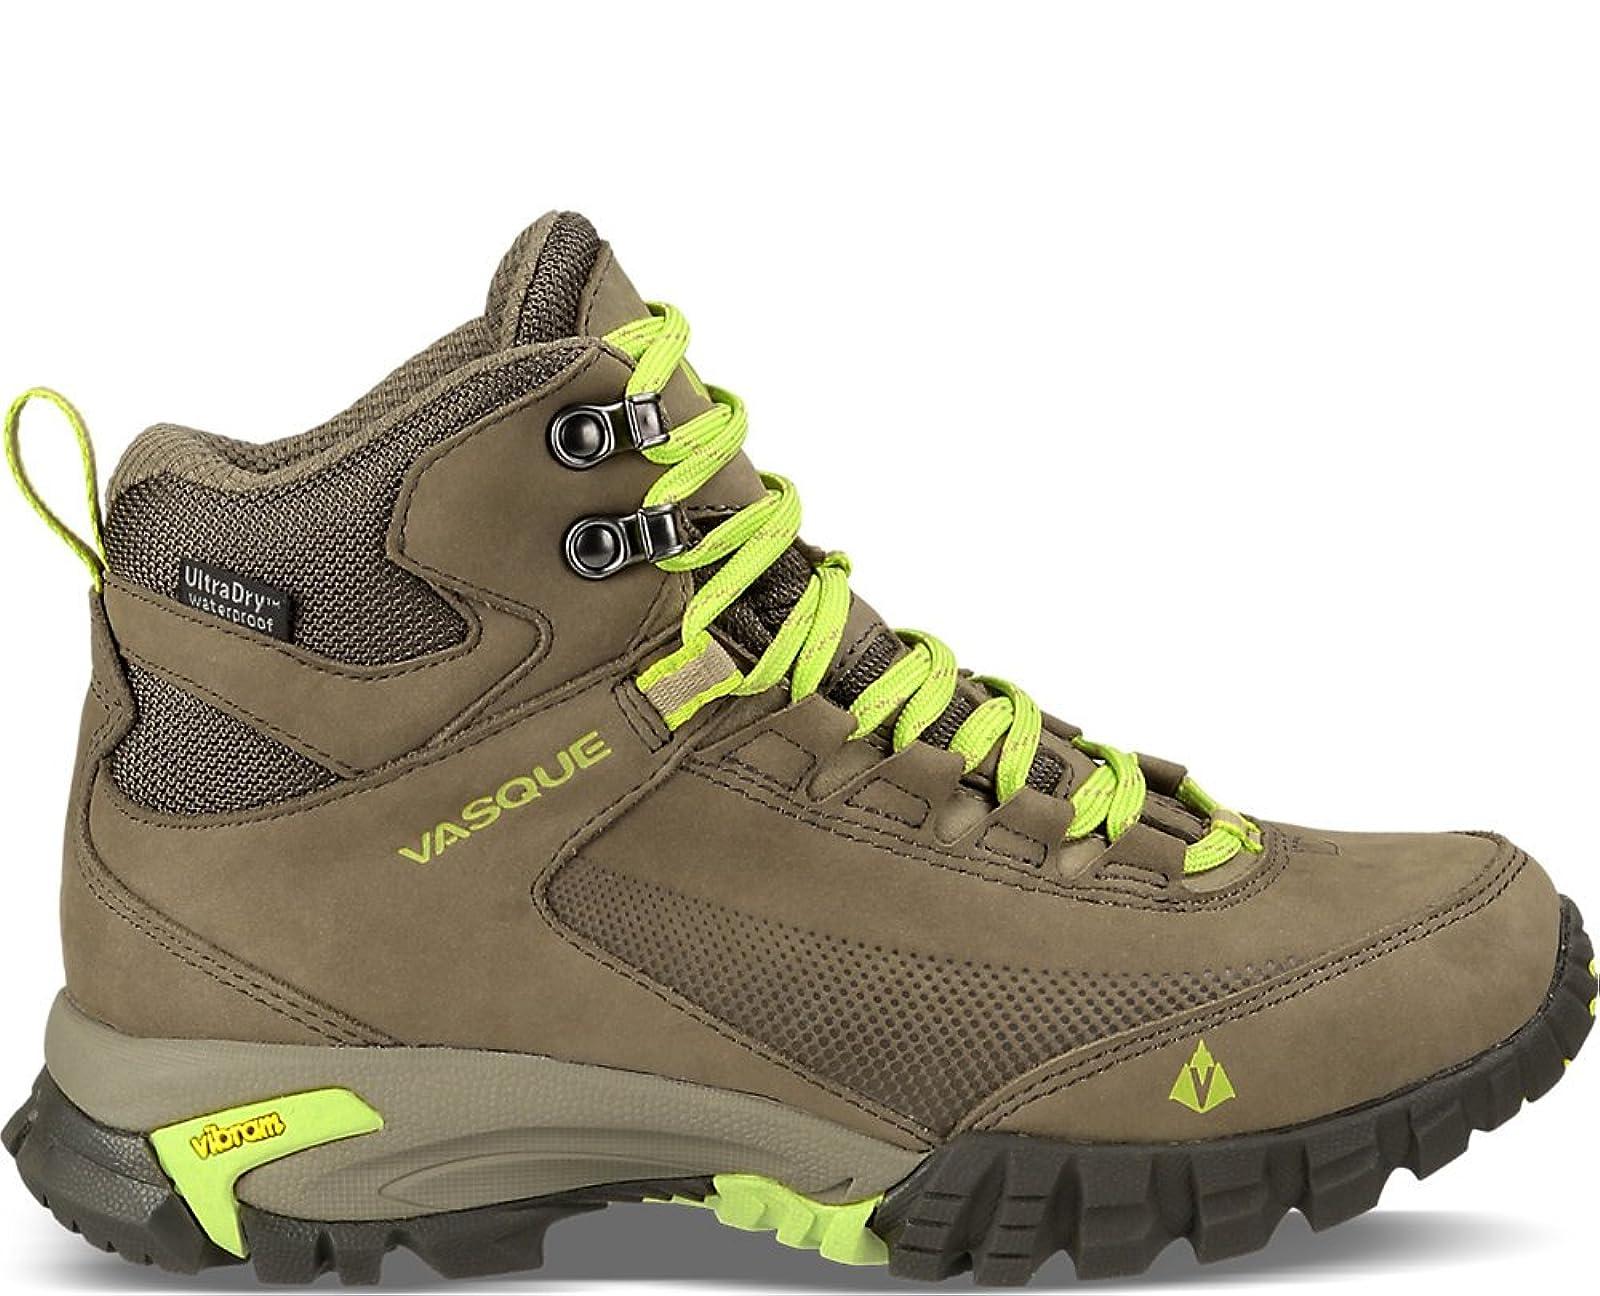 Vasque Women's Talus Trek UltraDry Hiking Boot US - 1